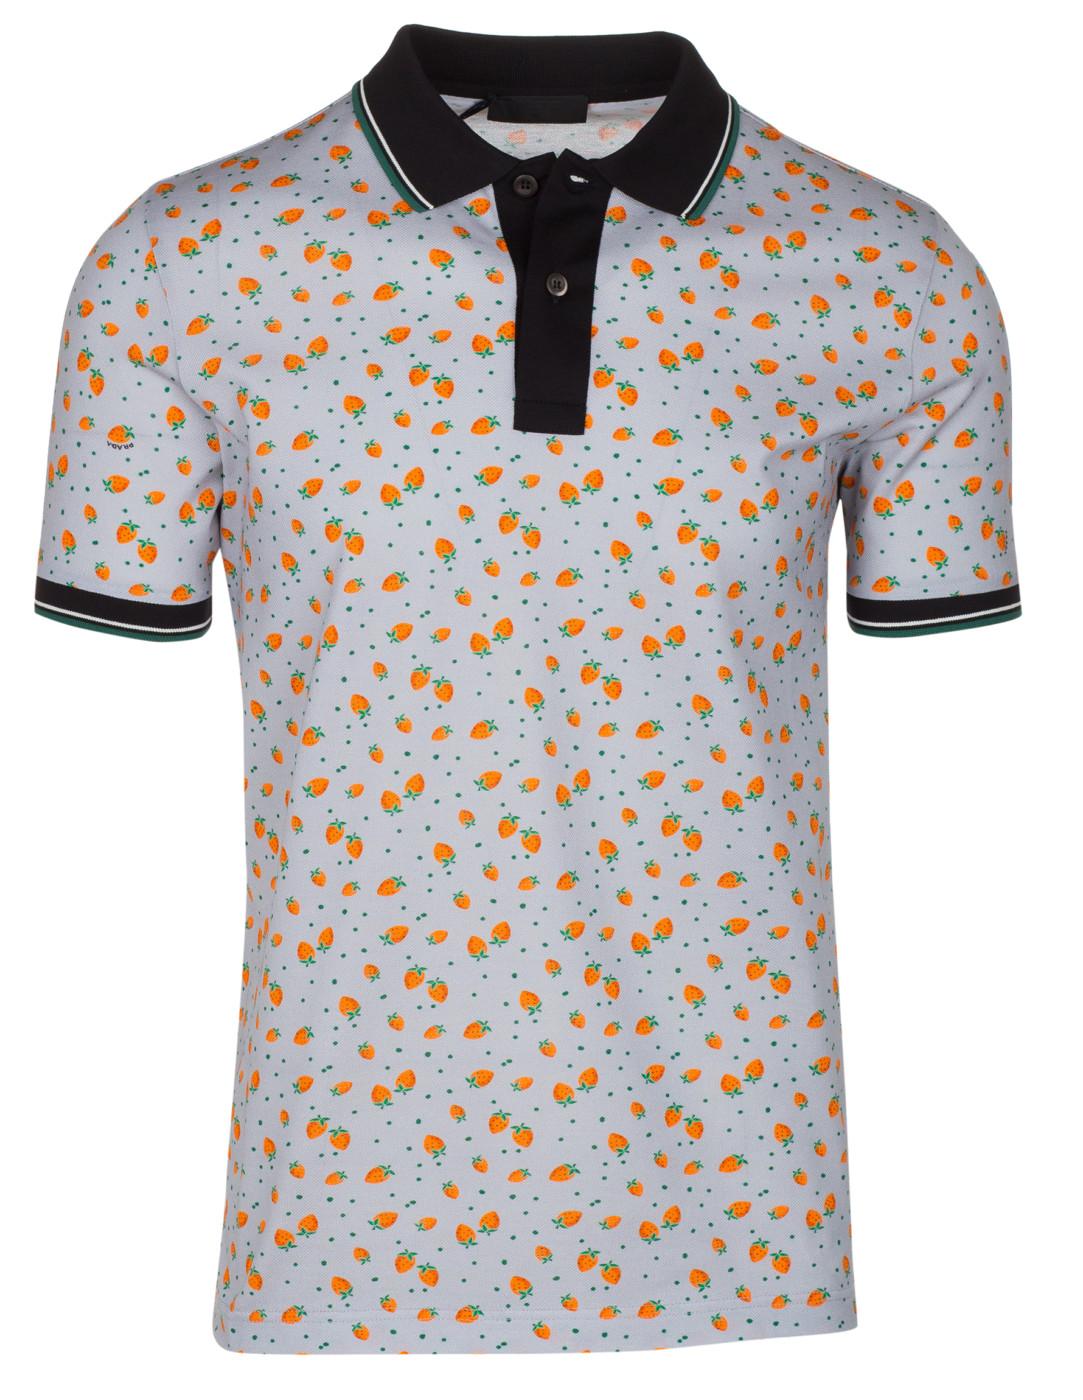 5b2cd02a Prada Men's Gray Cotton Strawberry Print Contrast Polo Shirt